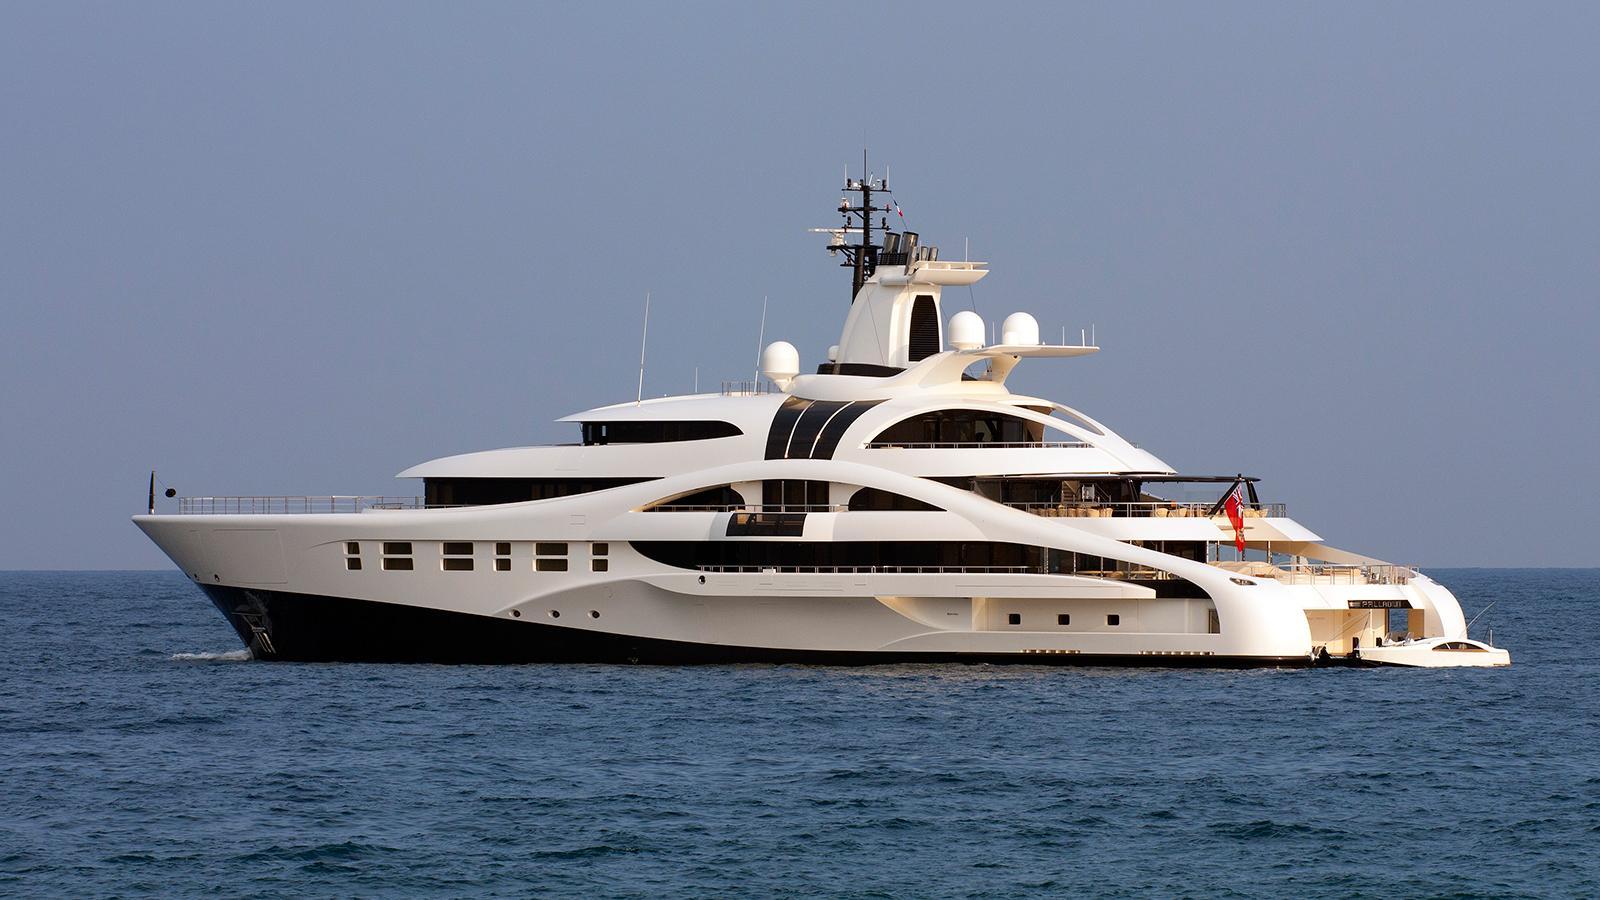 palladium-motor-yacht-blohm-voss-2010-96m-profile